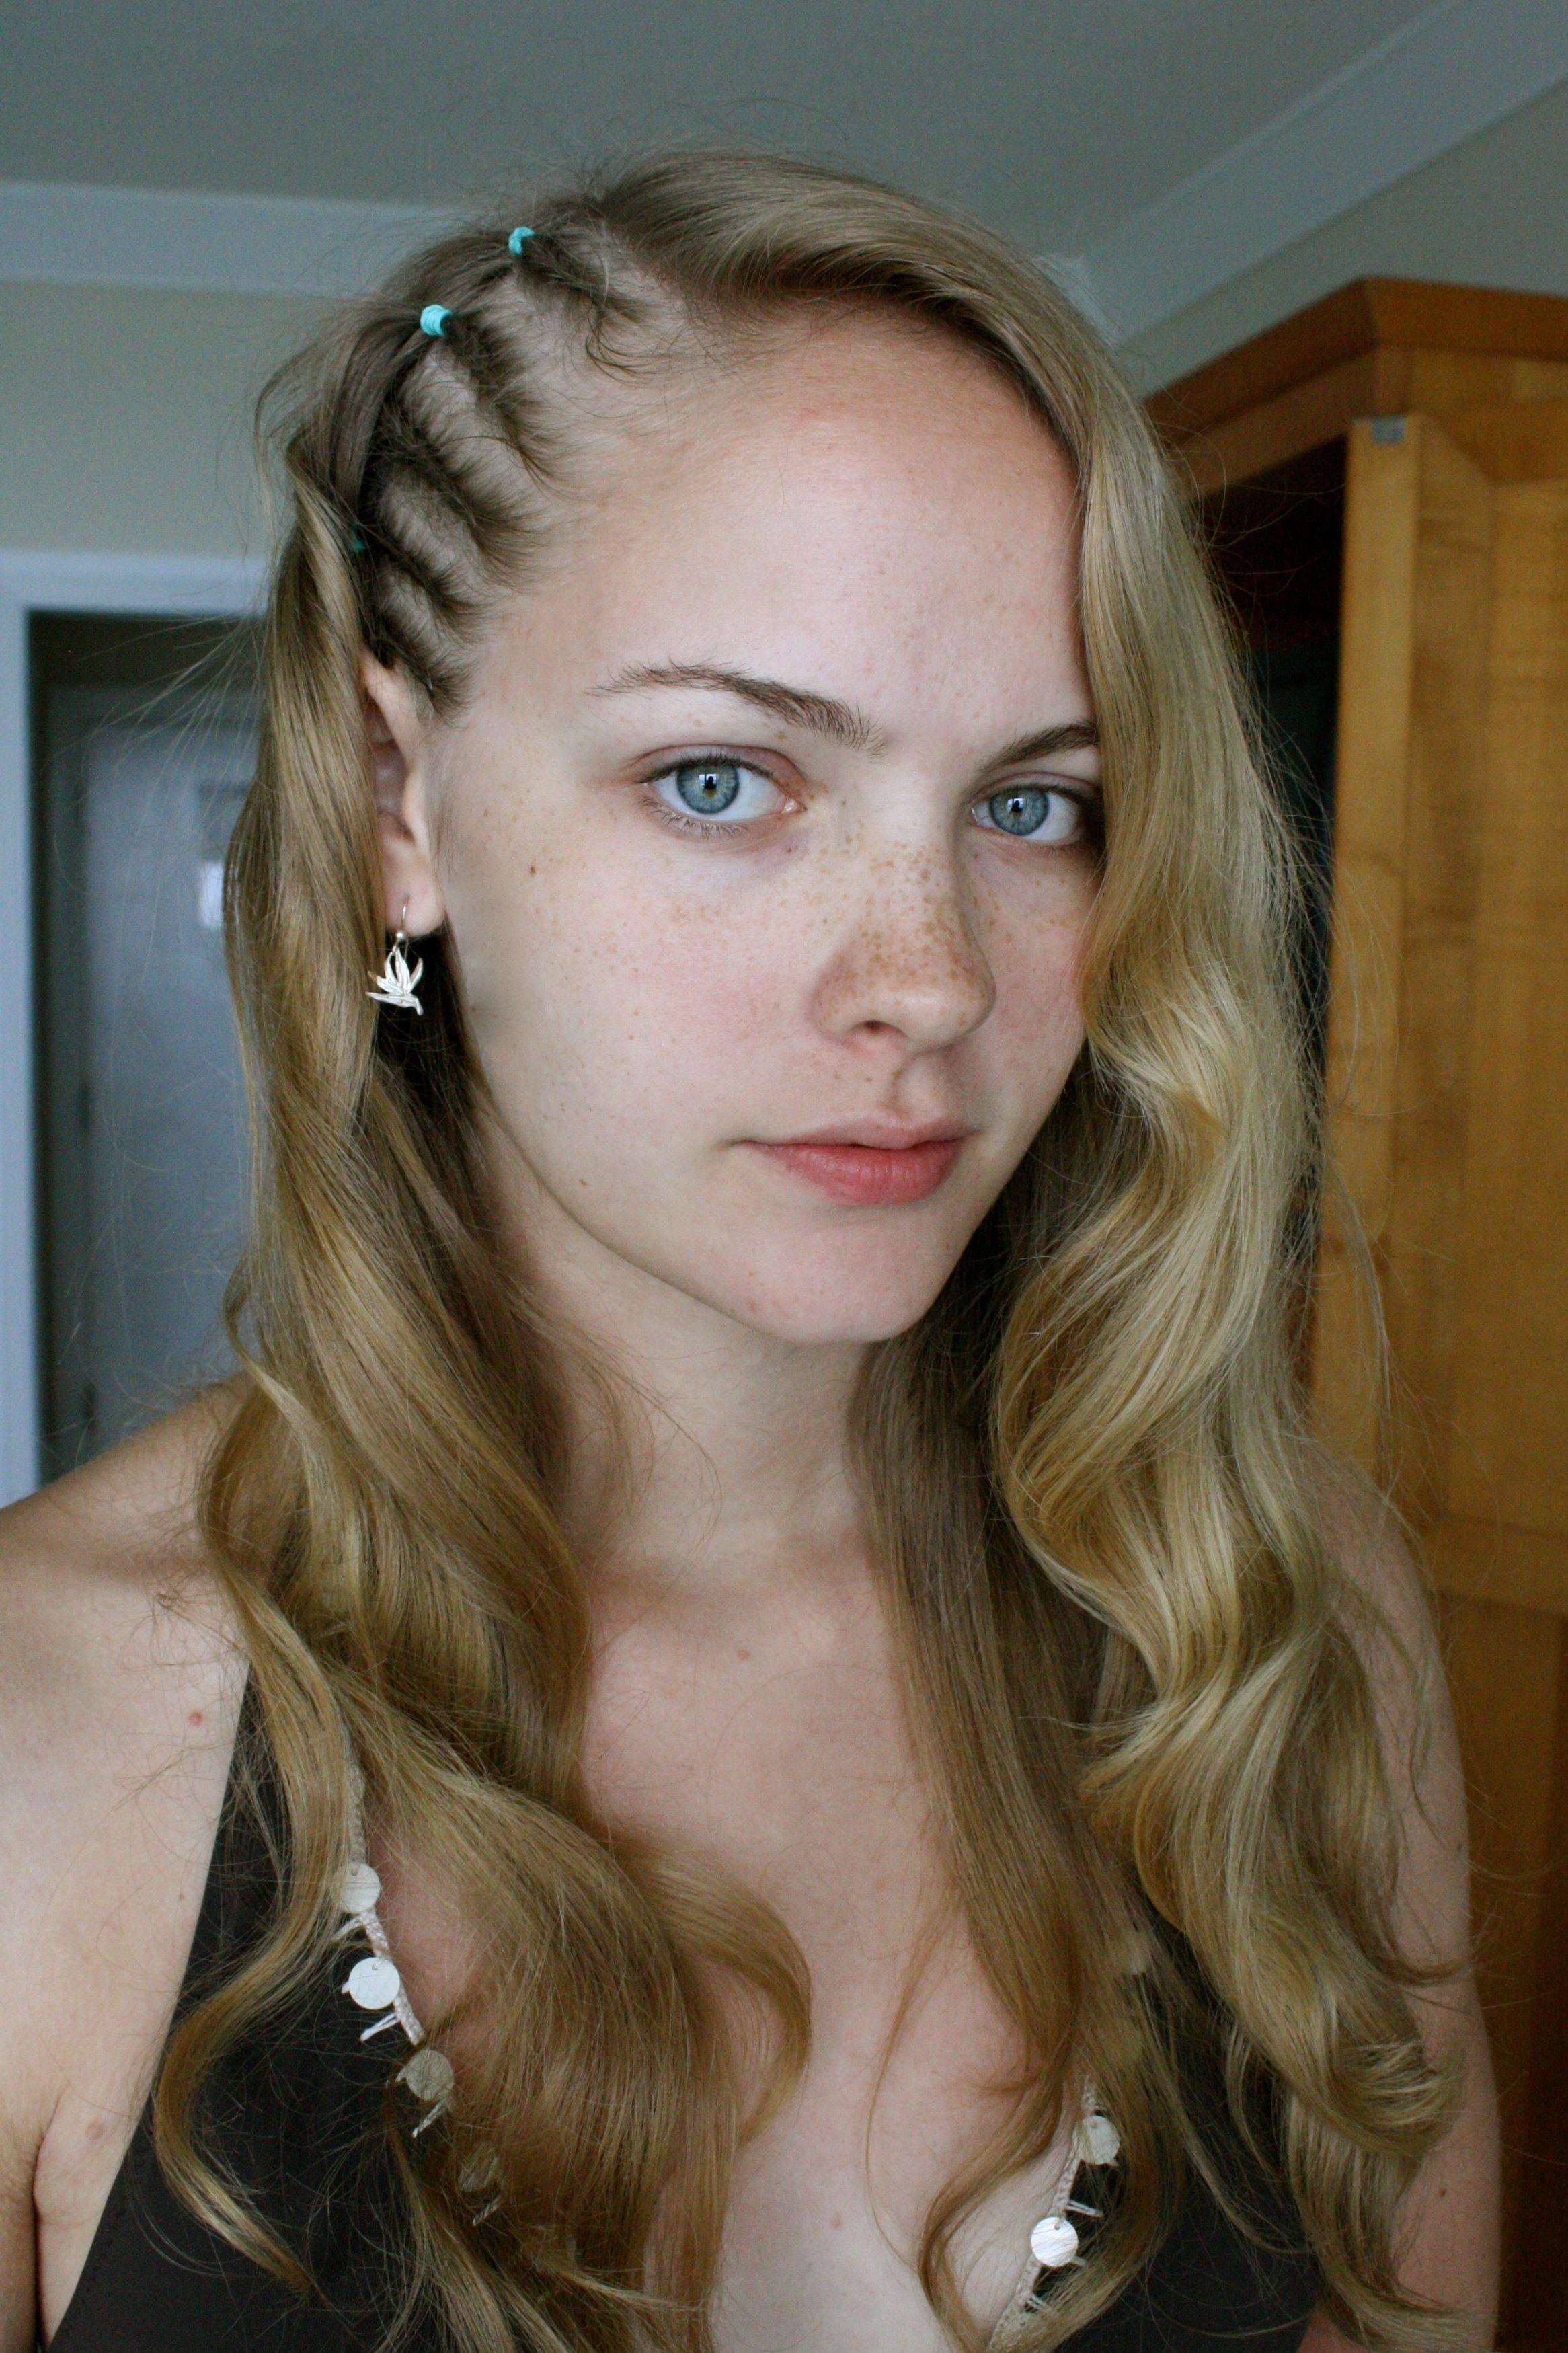 Swell White Girl Corn Rows Hair Make Up Pinterest White Girls Hairstyle Inspiration Daily Dogsangcom